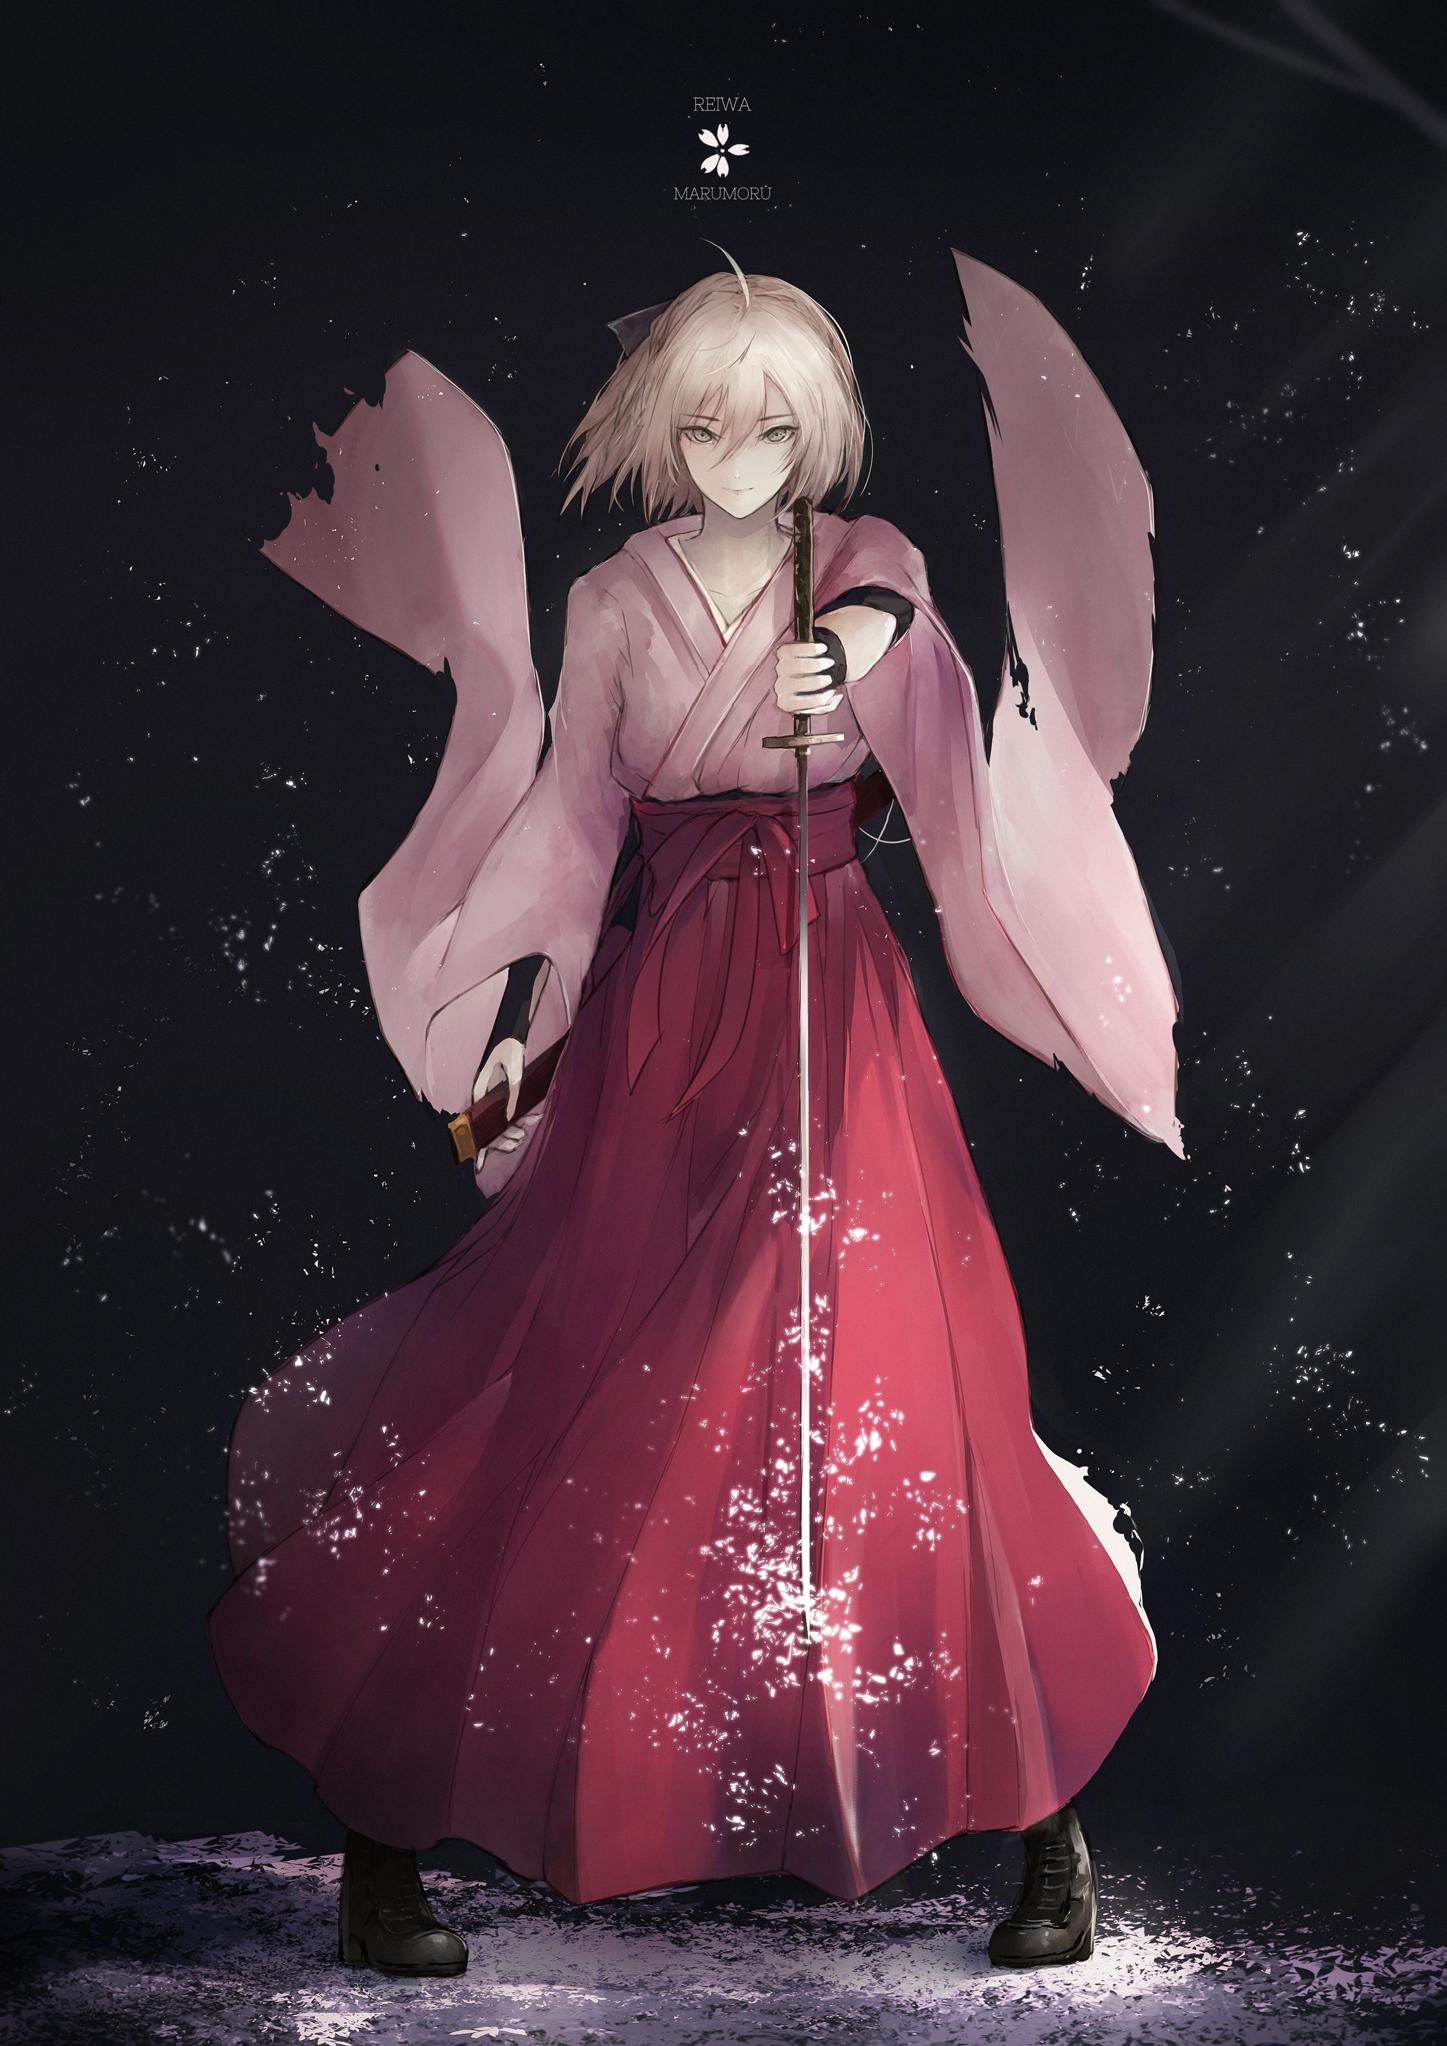 【P站画师】日本画师marumoru的插画作品- ACG17.COM